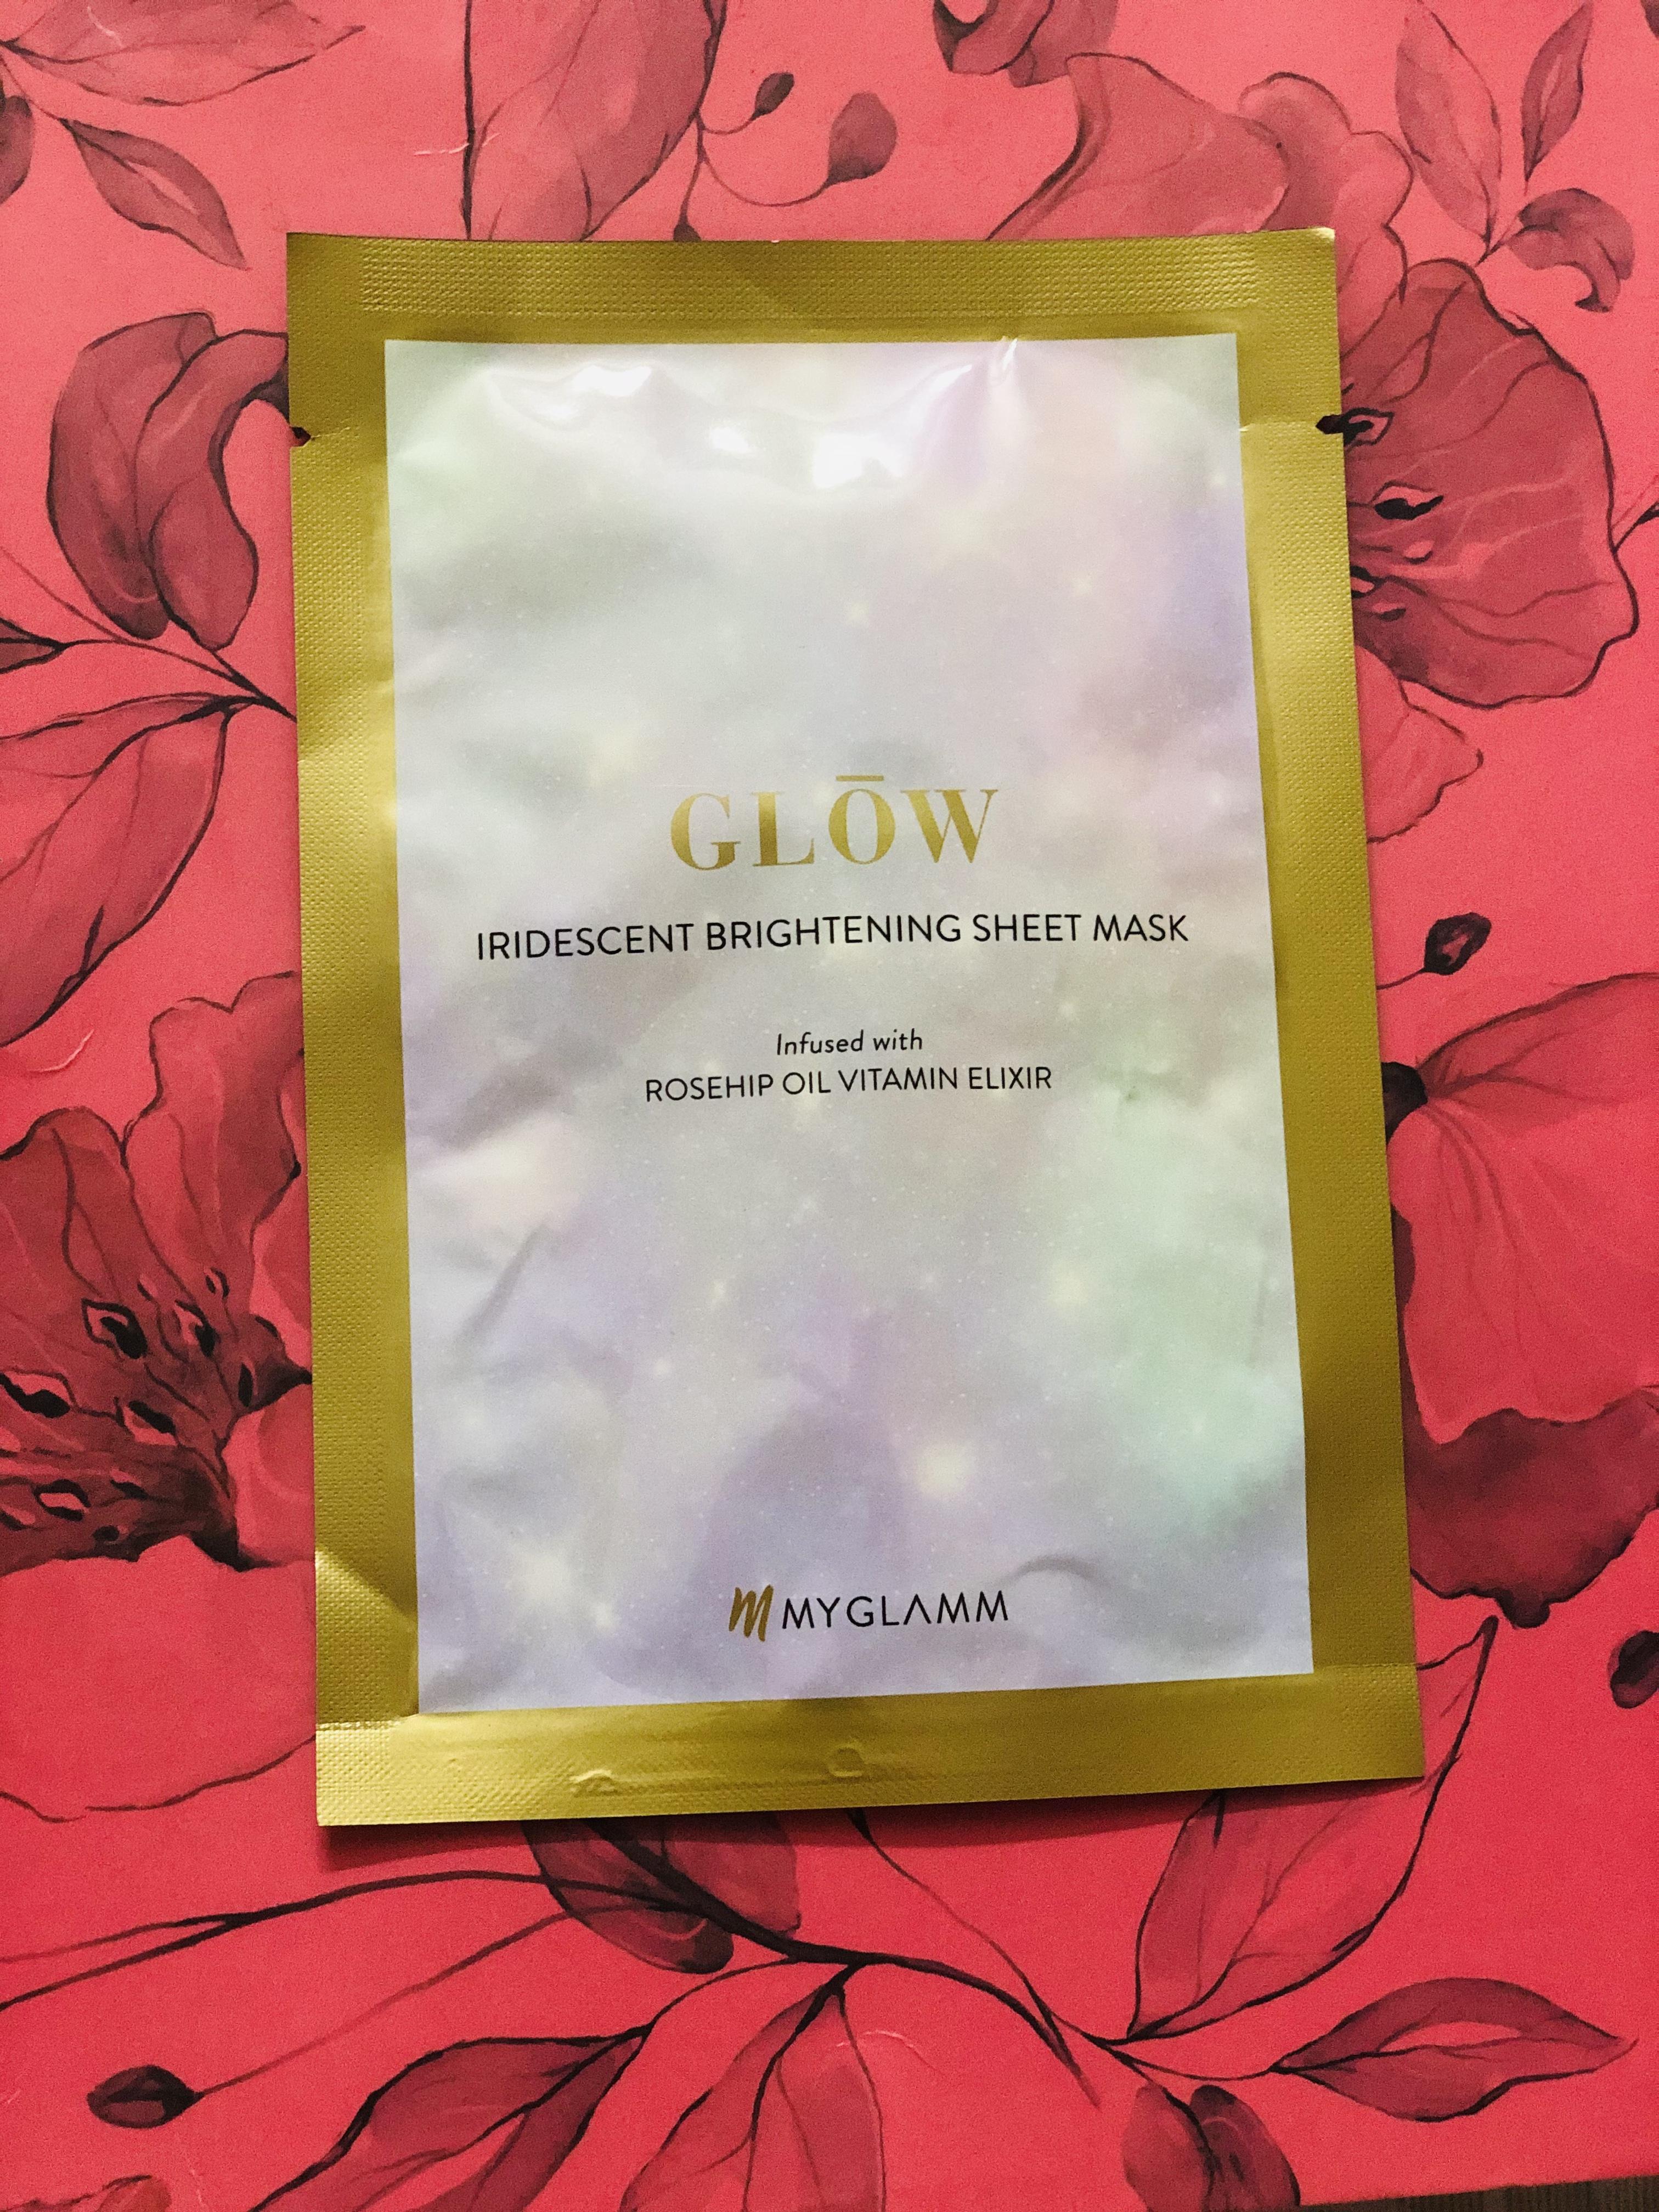 MyGlamm Glow Iridescent Brightening Sheet Mask Rosehip Extract Vitamin Elixir-Instant glow-By ritzytweety